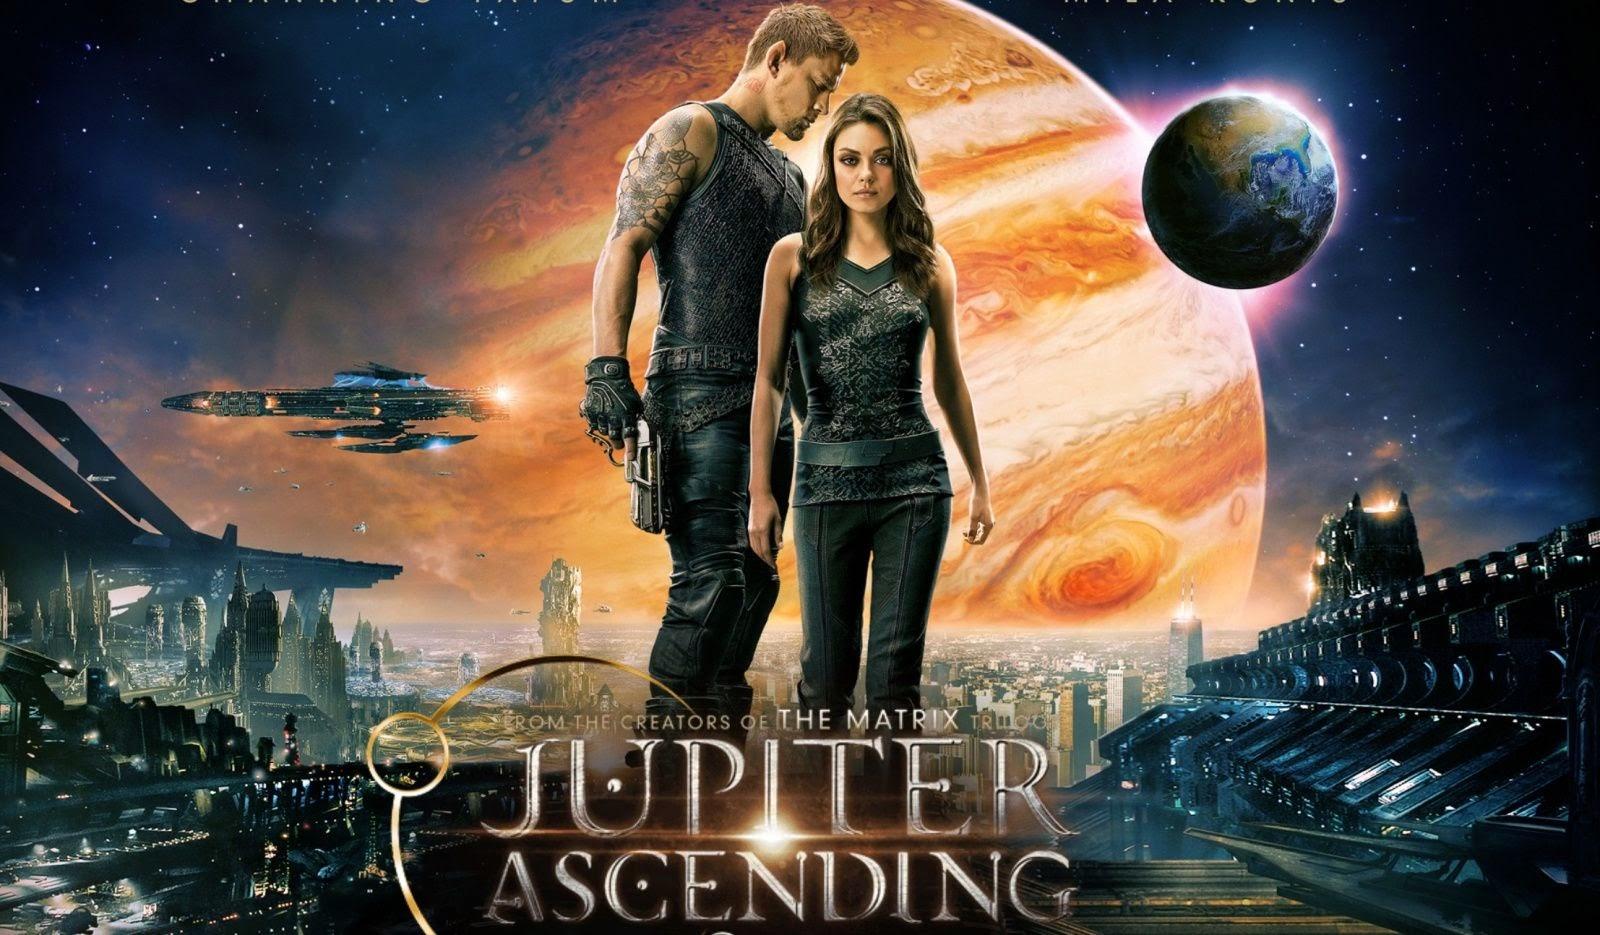 Jupiter Ascending o El Destino de Jupiter, ciencia ficción